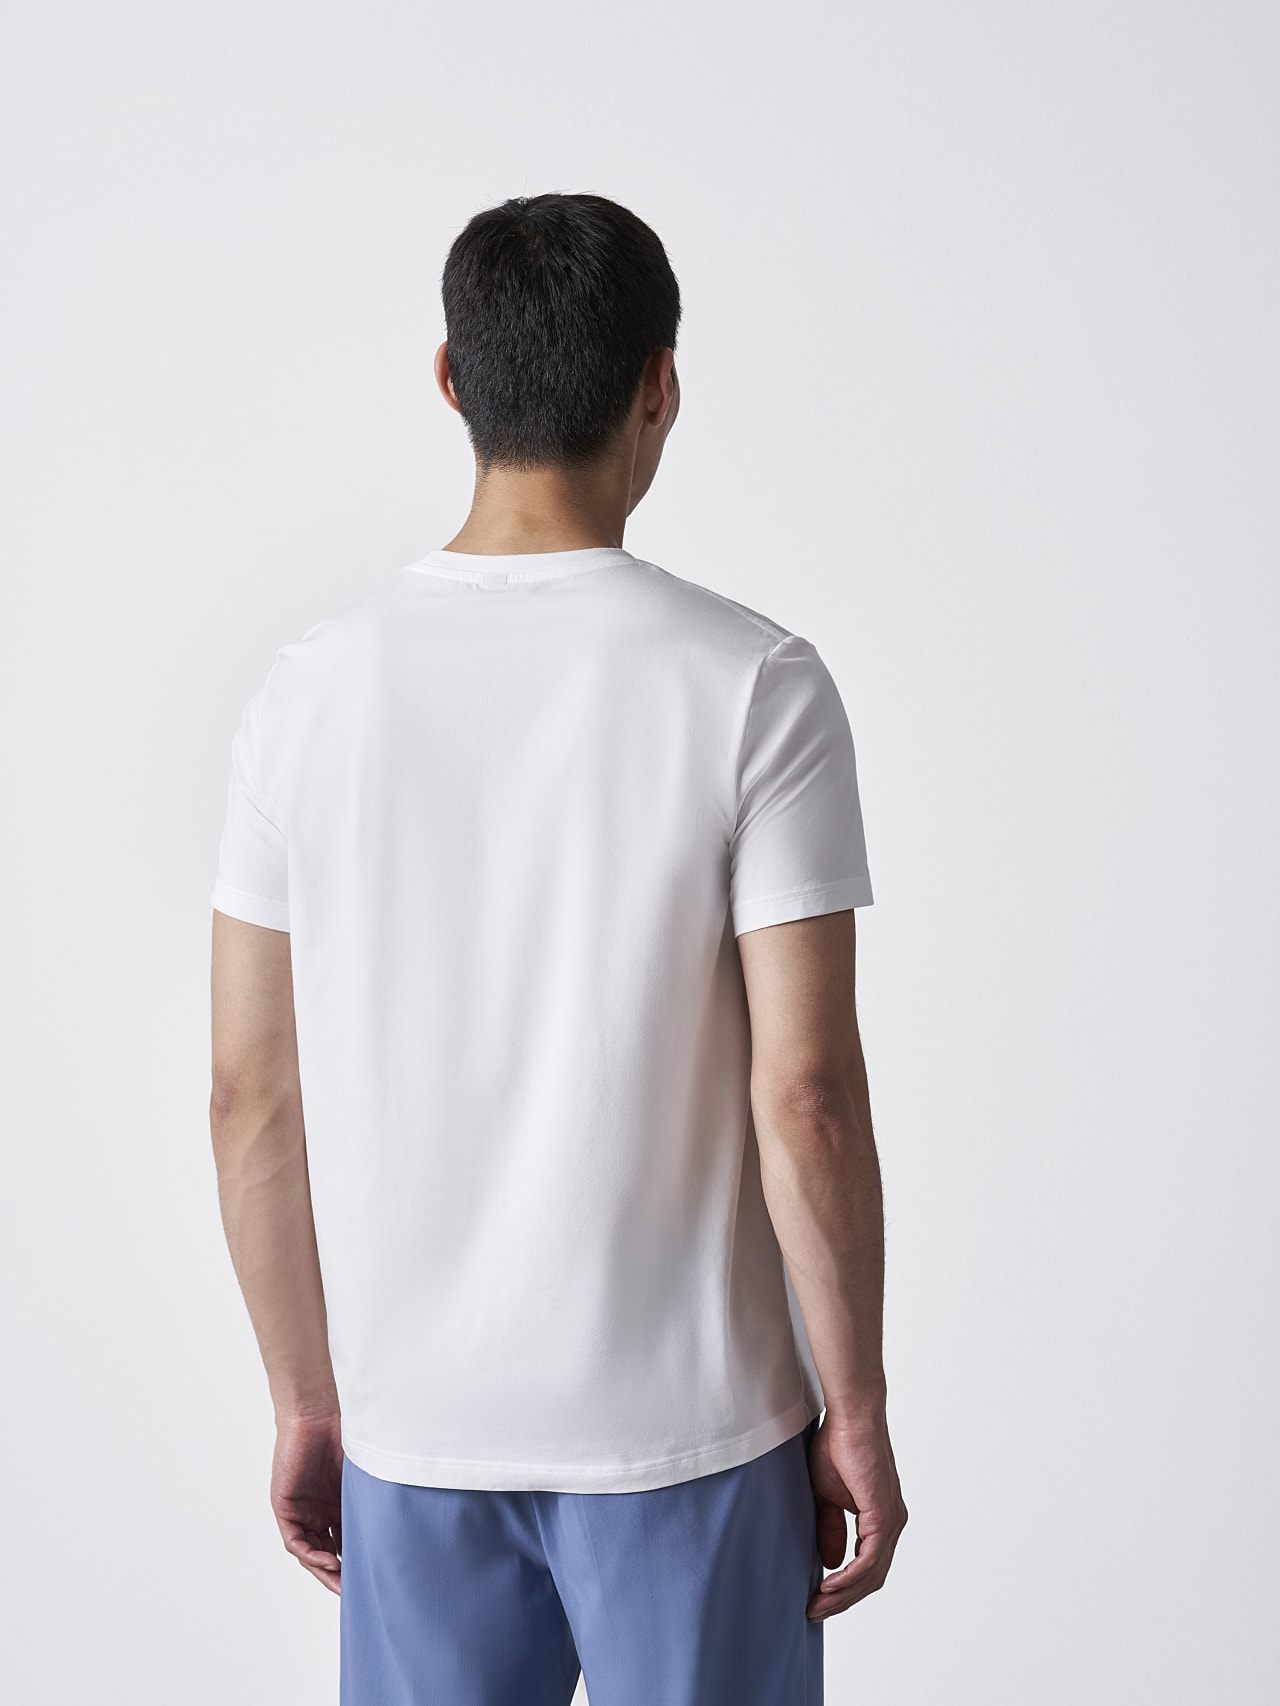 JERO V2.Y4.02 Signature Logo T-Shirt white Front Main Alpha Tauri